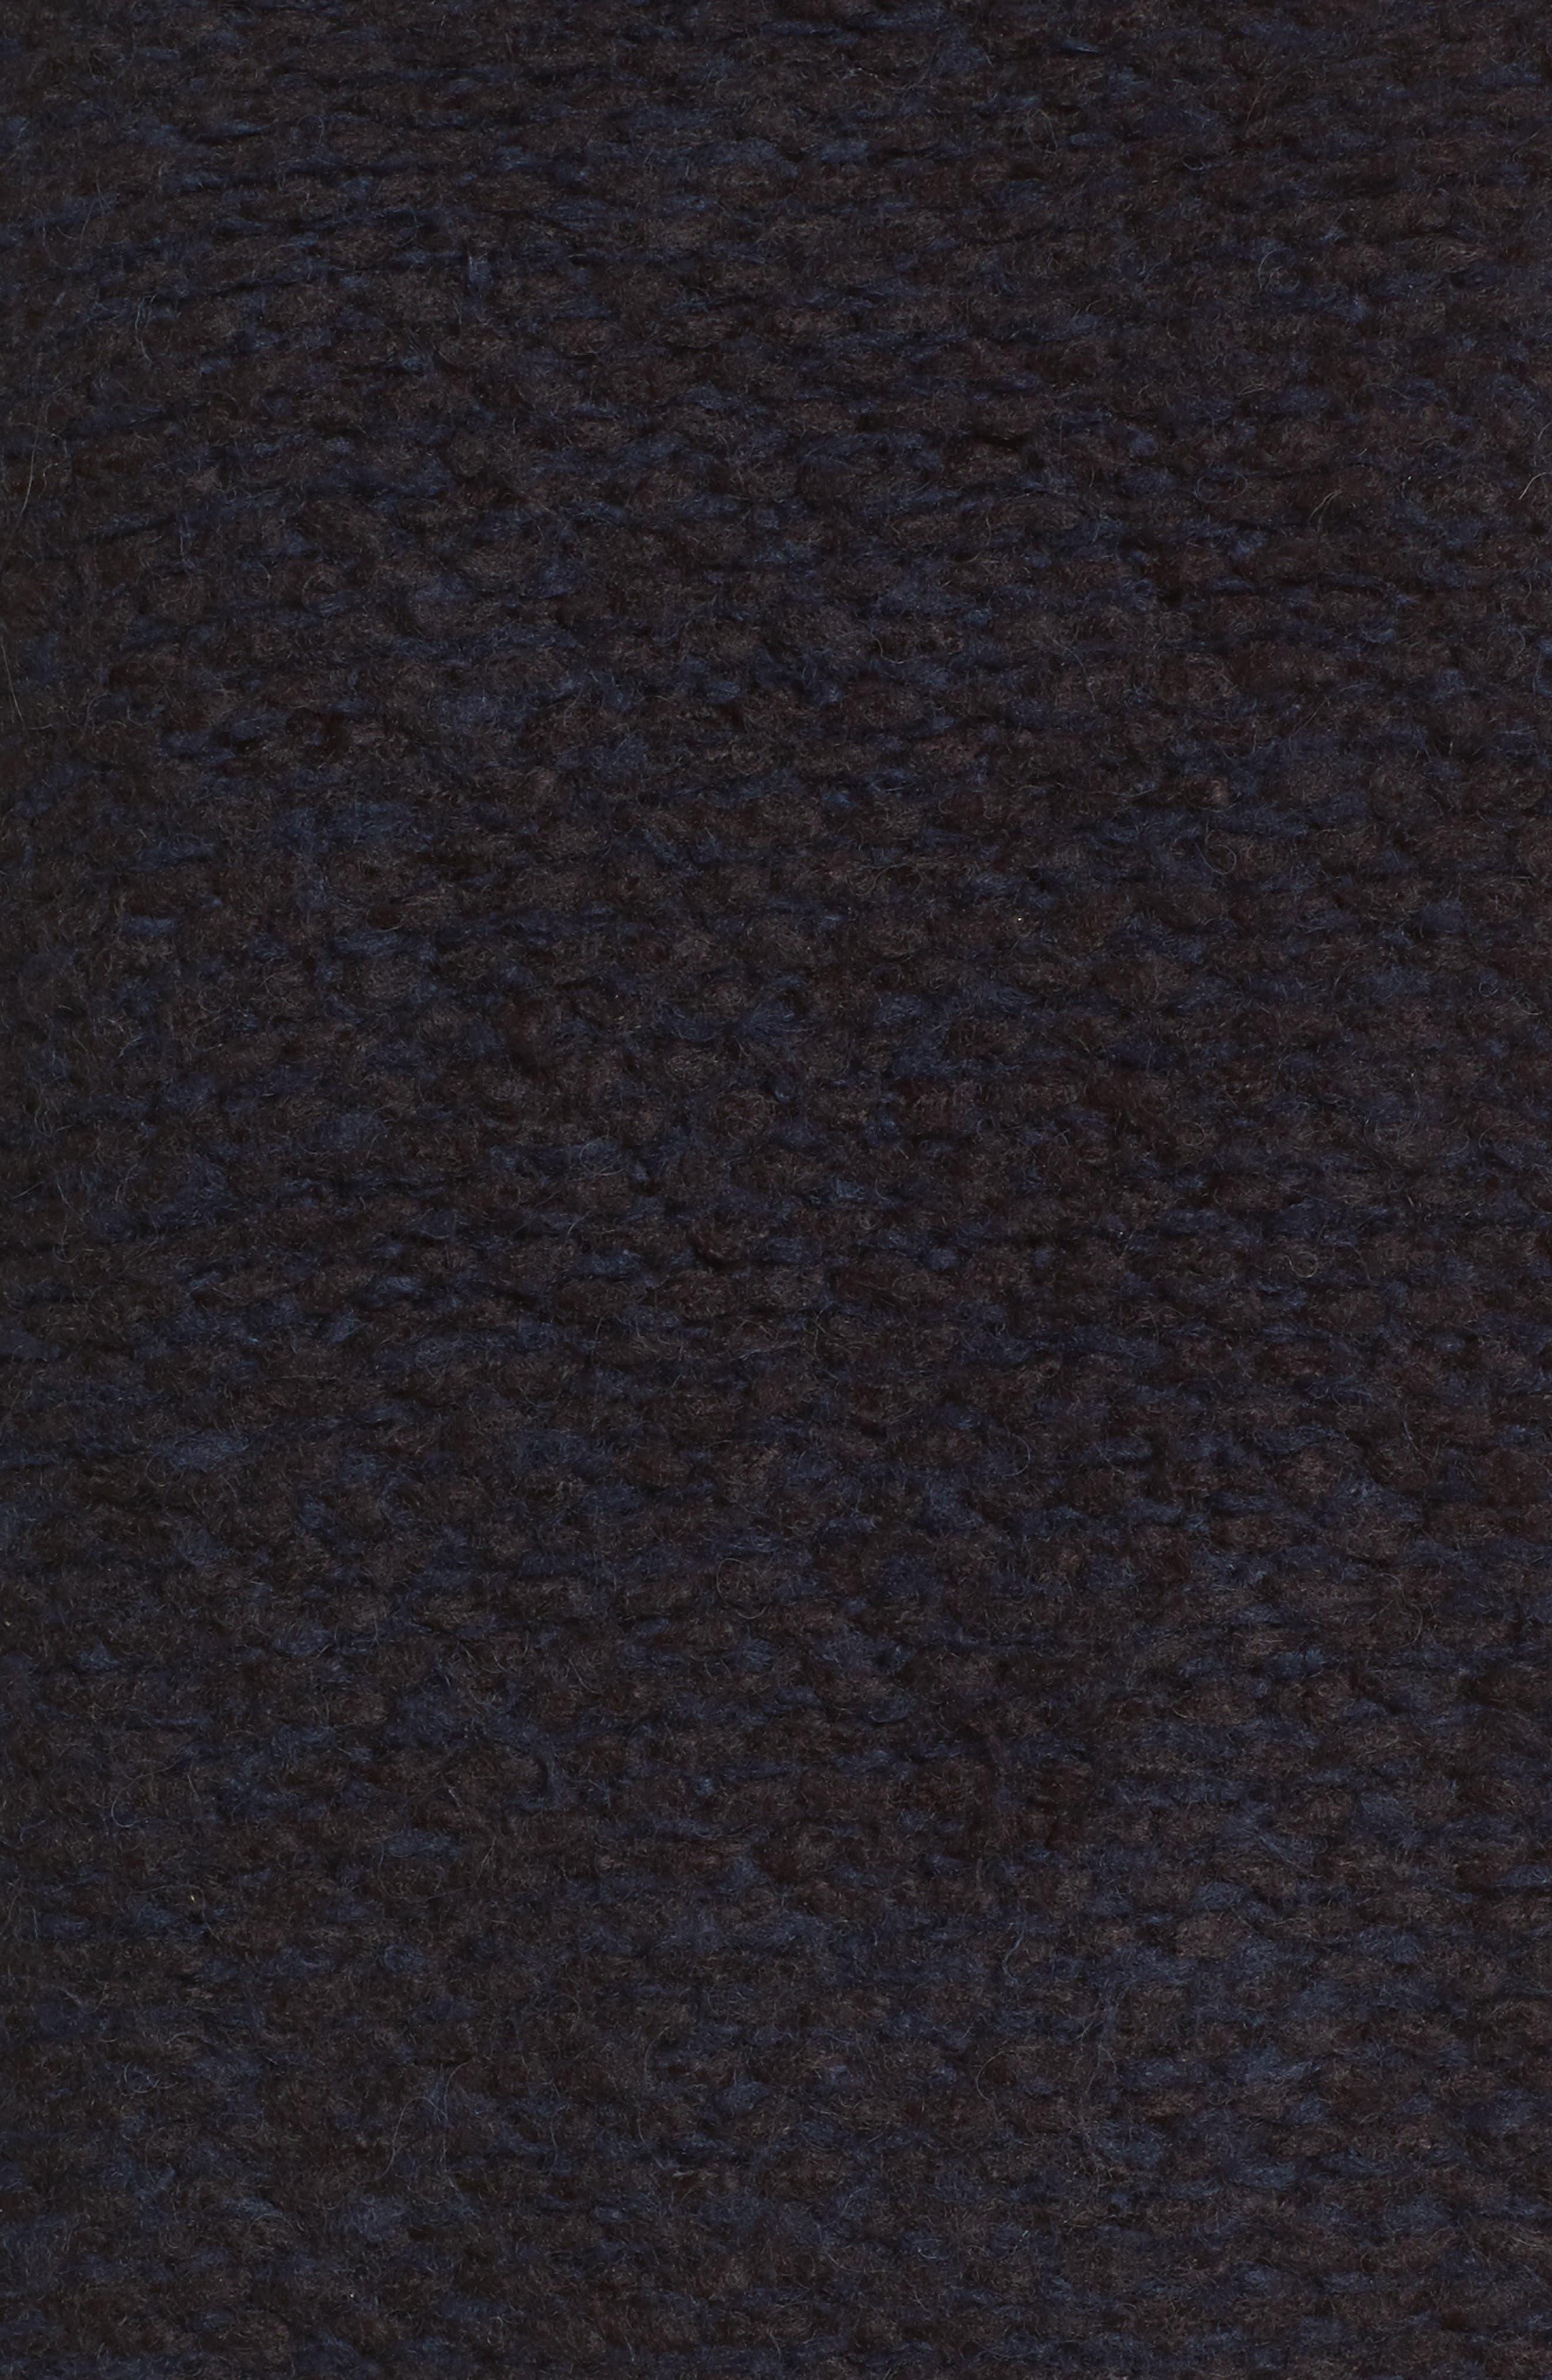 Kinks Turtleneck Sweater,                             Alternate thumbnail 9, color,